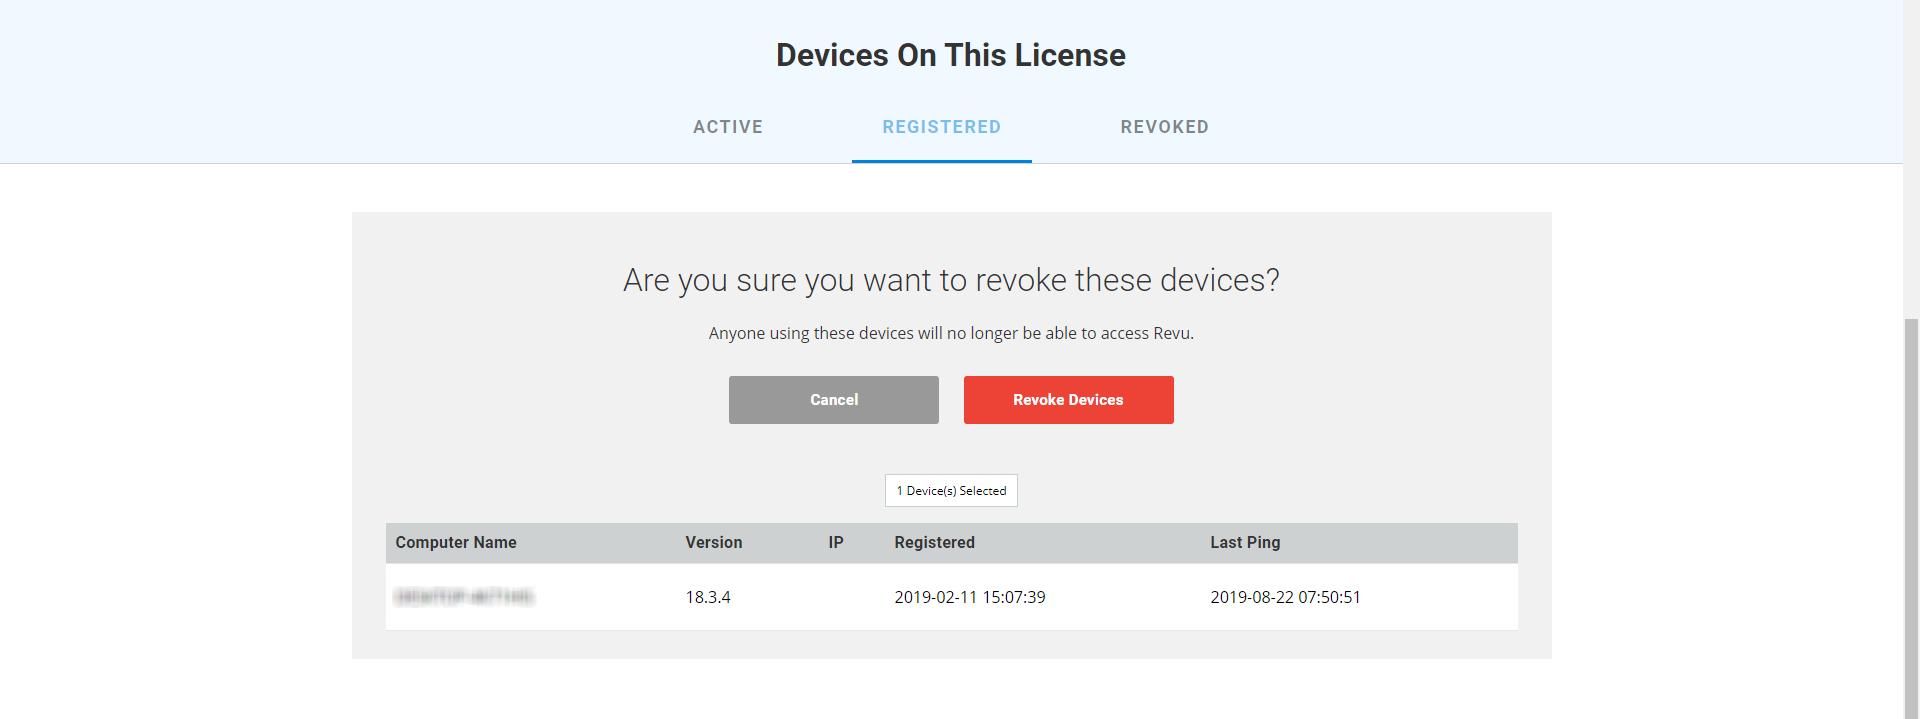 Revoke devices for open license in Bluebeam Revu